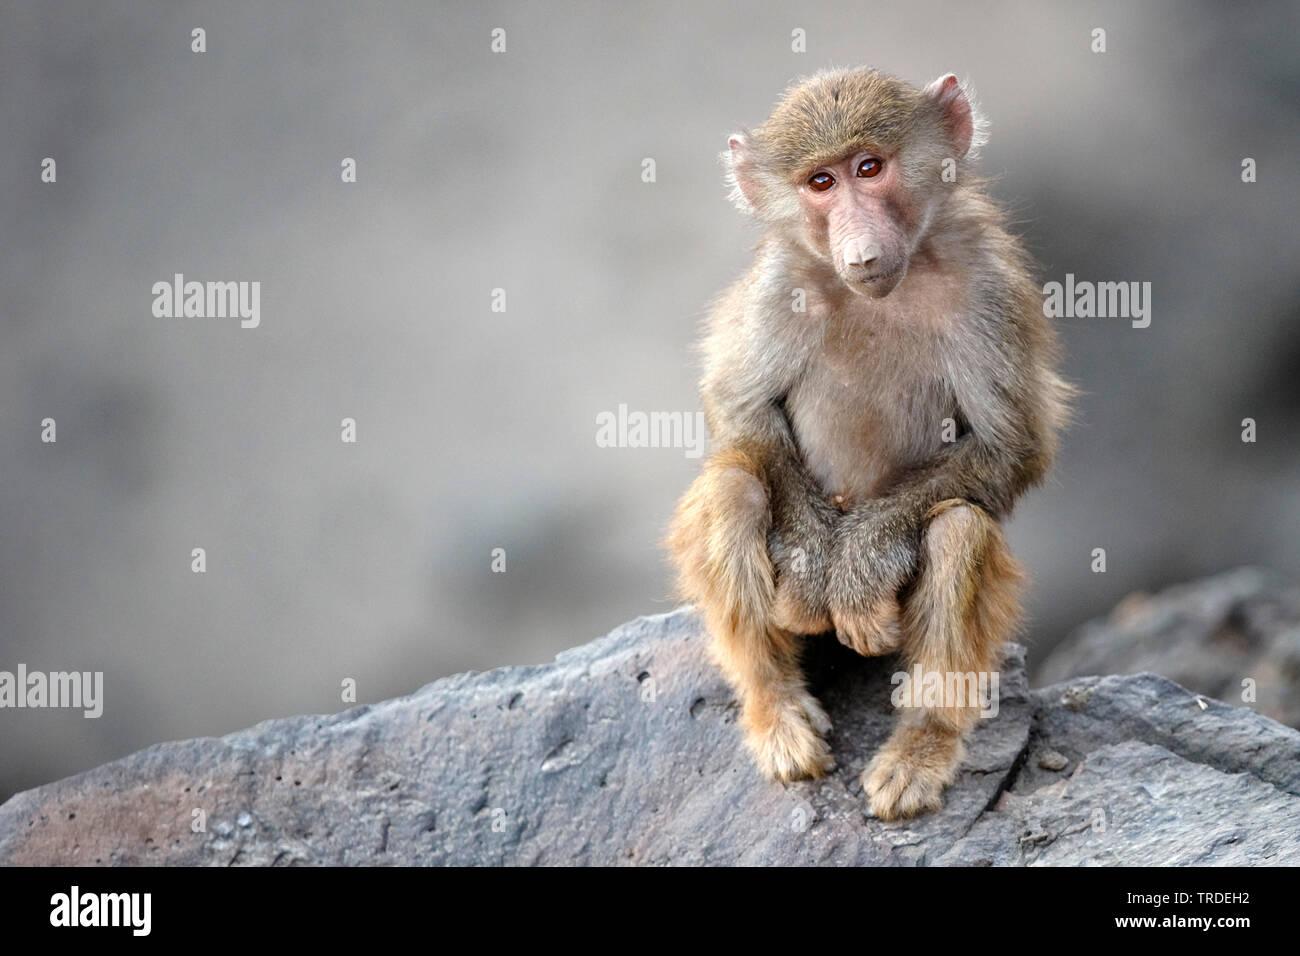 Mantelpavian, Mantel-Pavian (Papio hamadryas), Jungtier sitzt auf einem Felsen, Aethiopien, Awash Nationalpark   hamadryas baboon, sacred baboon (Papi - Stock Image